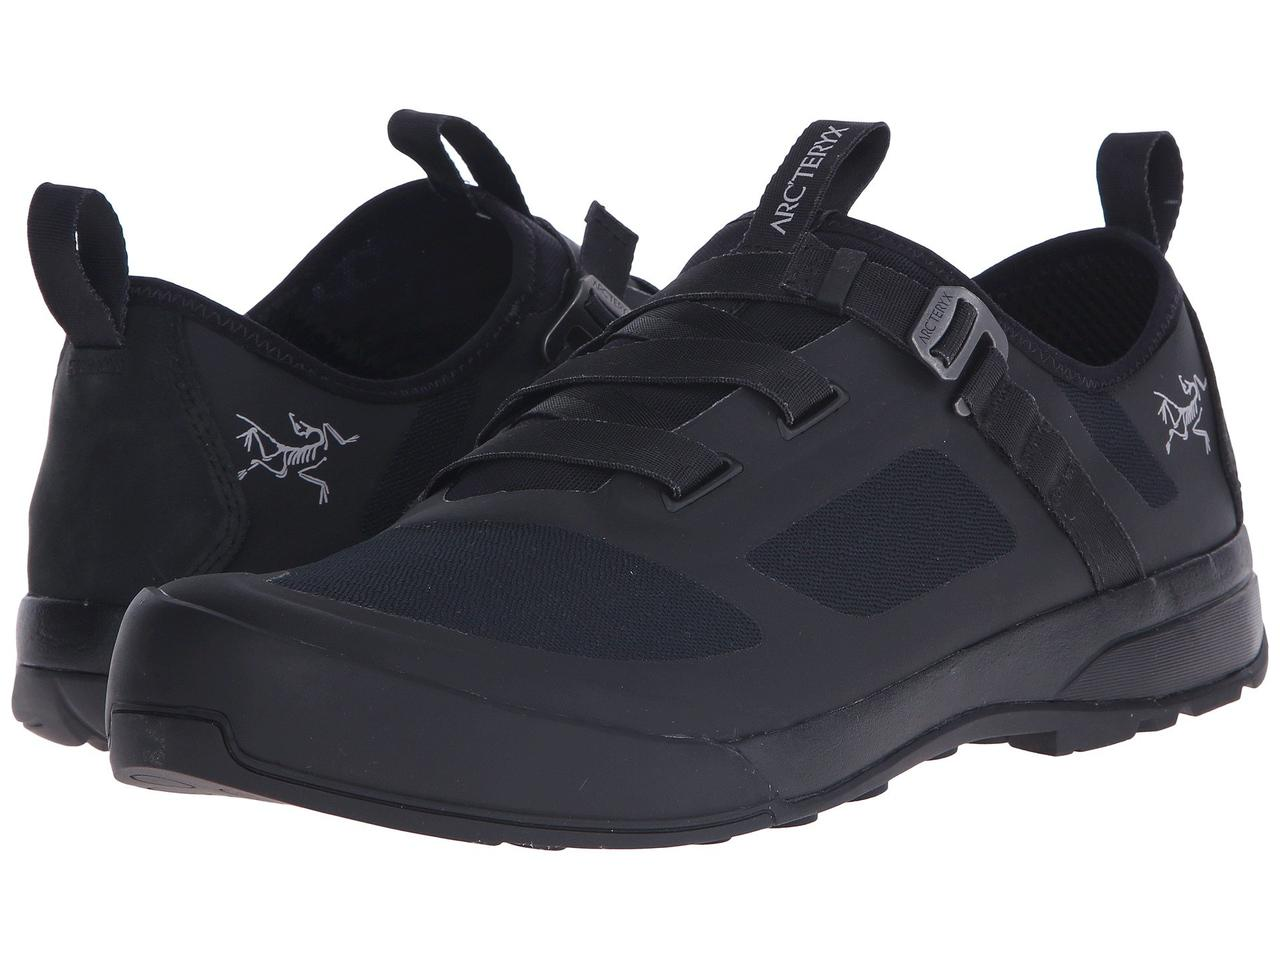 99d8c7093b7e Кроссовки Кеды (Оригинал) Arc teryx Arakys Approach Shoe Black Black ...